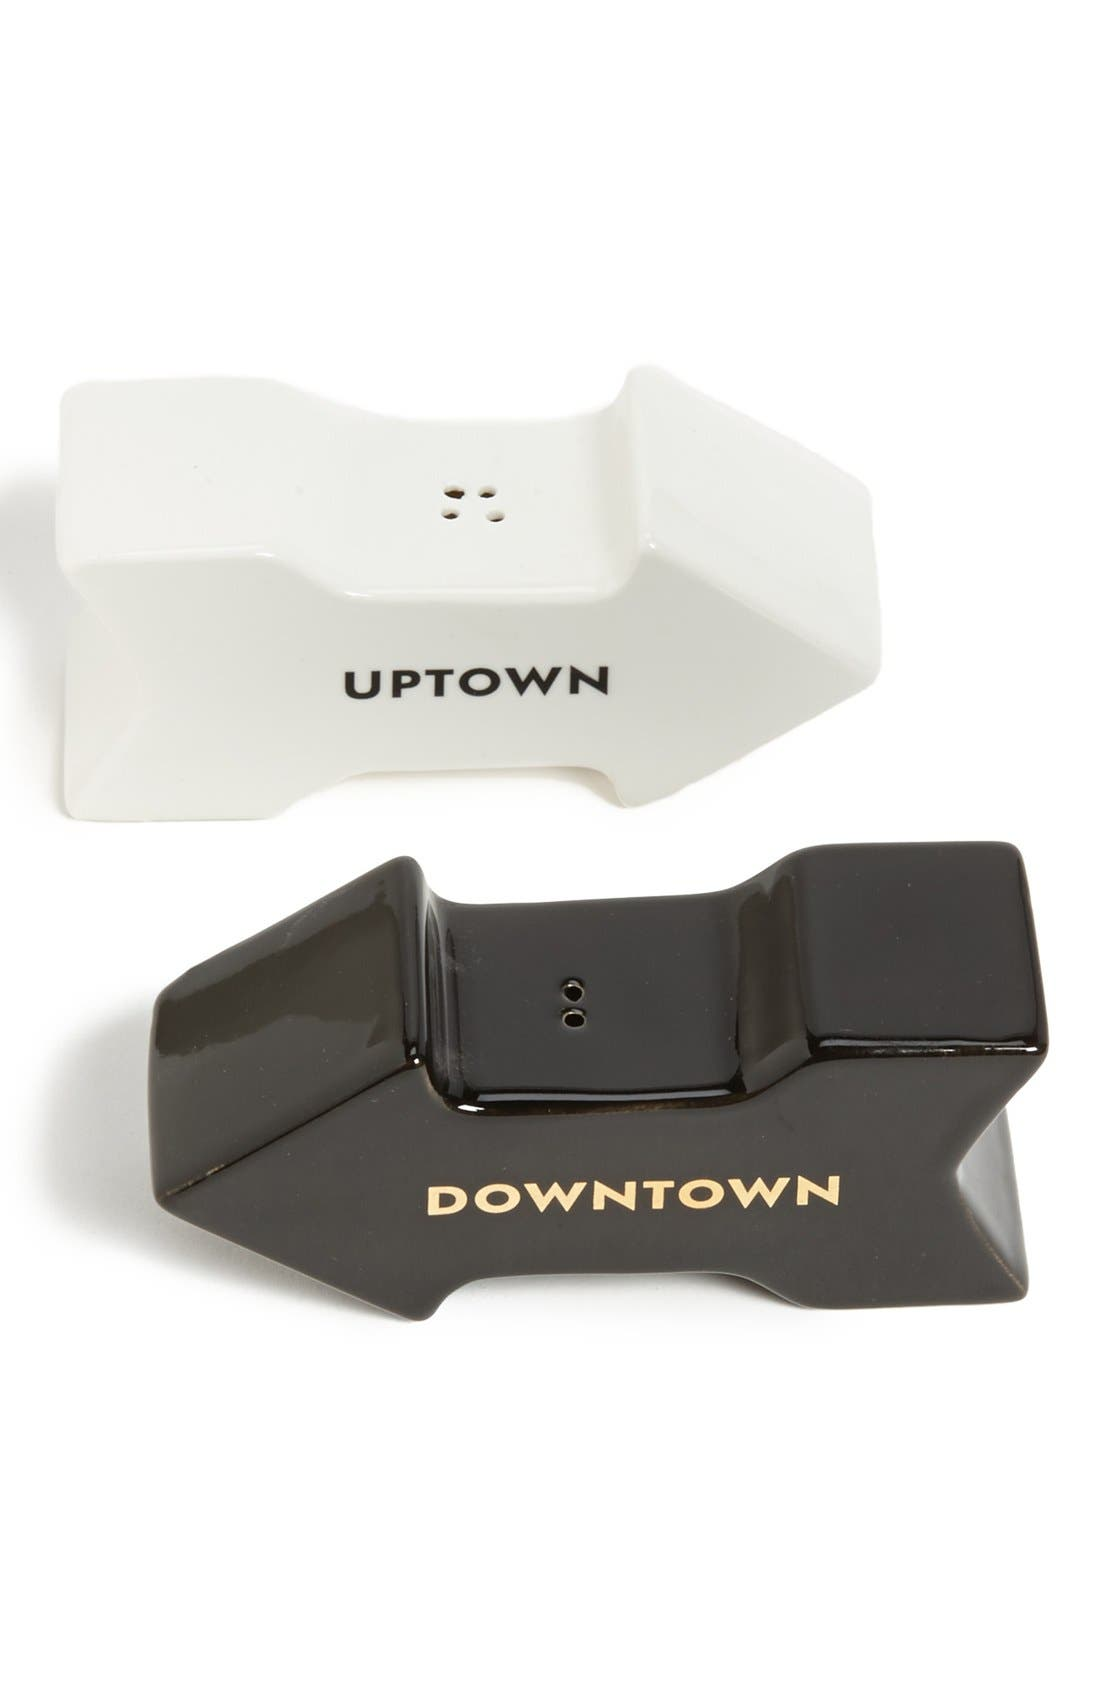 Alternate Image 1 Selected - kate spade new york 'fairmount park - uptown downtown' salt & pepper set